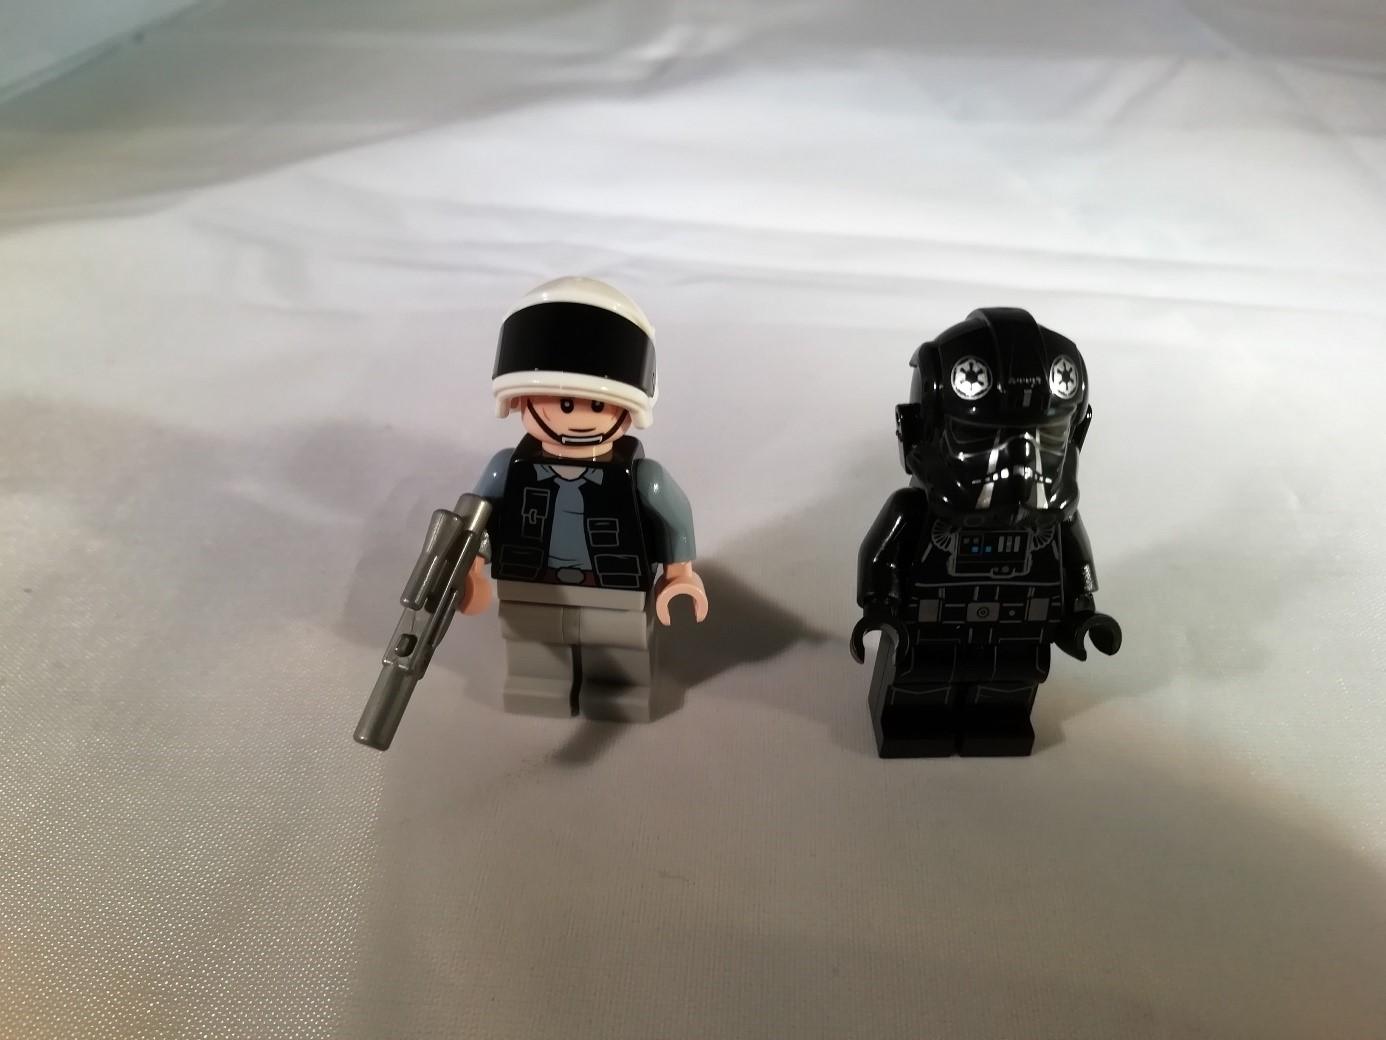 Beide Figuren mit Kopfbedeckung